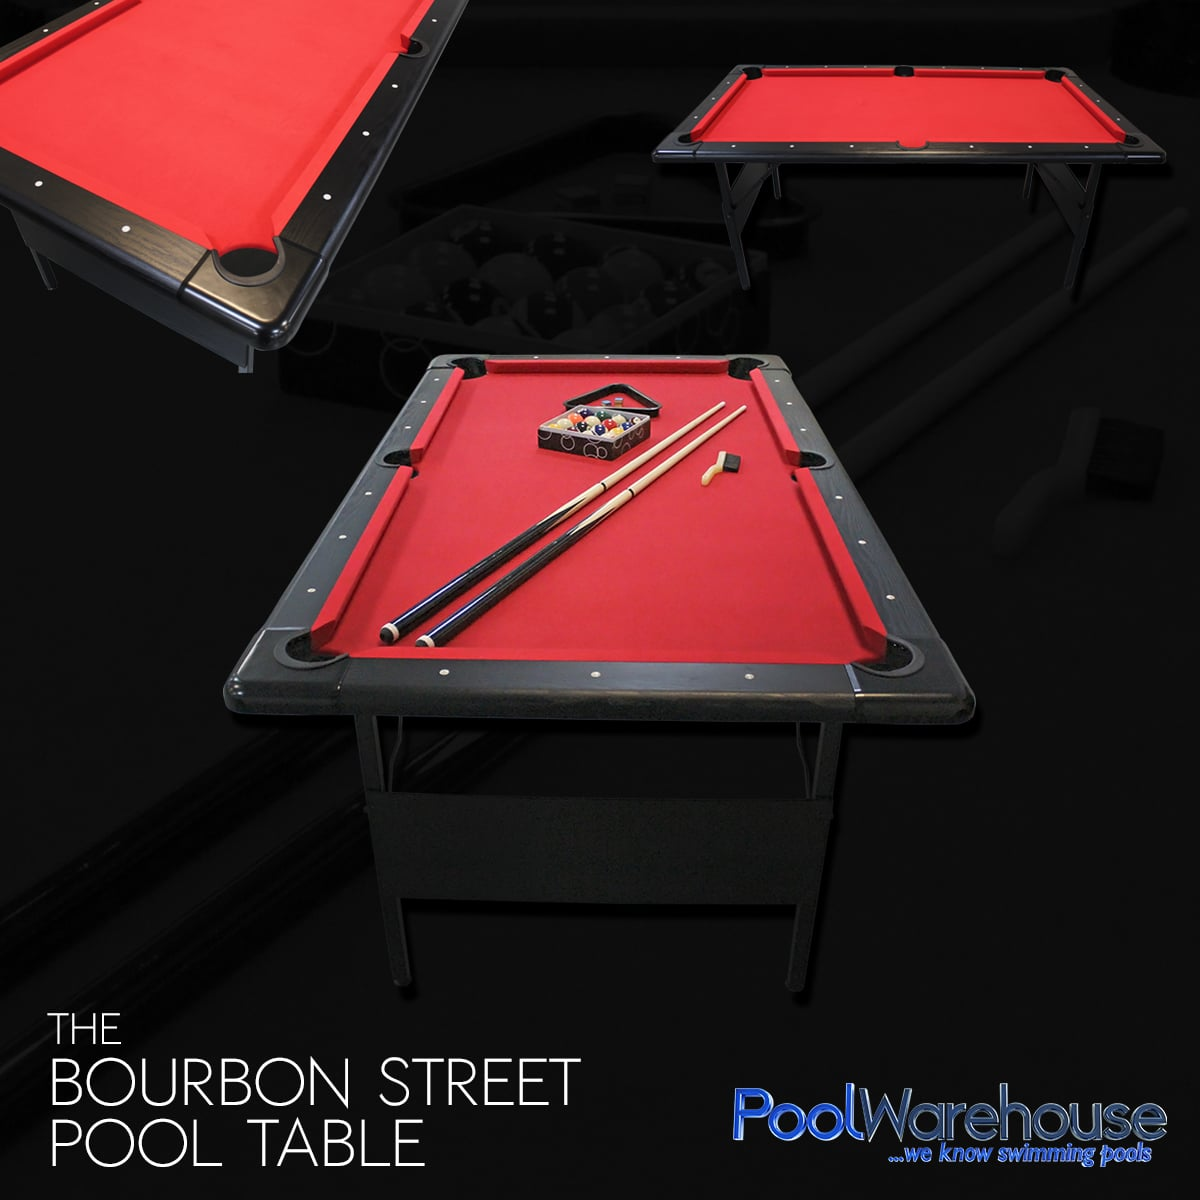 Bourbon Street Pool Table Fairmont Portable Pool Table - Pool table equipment near me